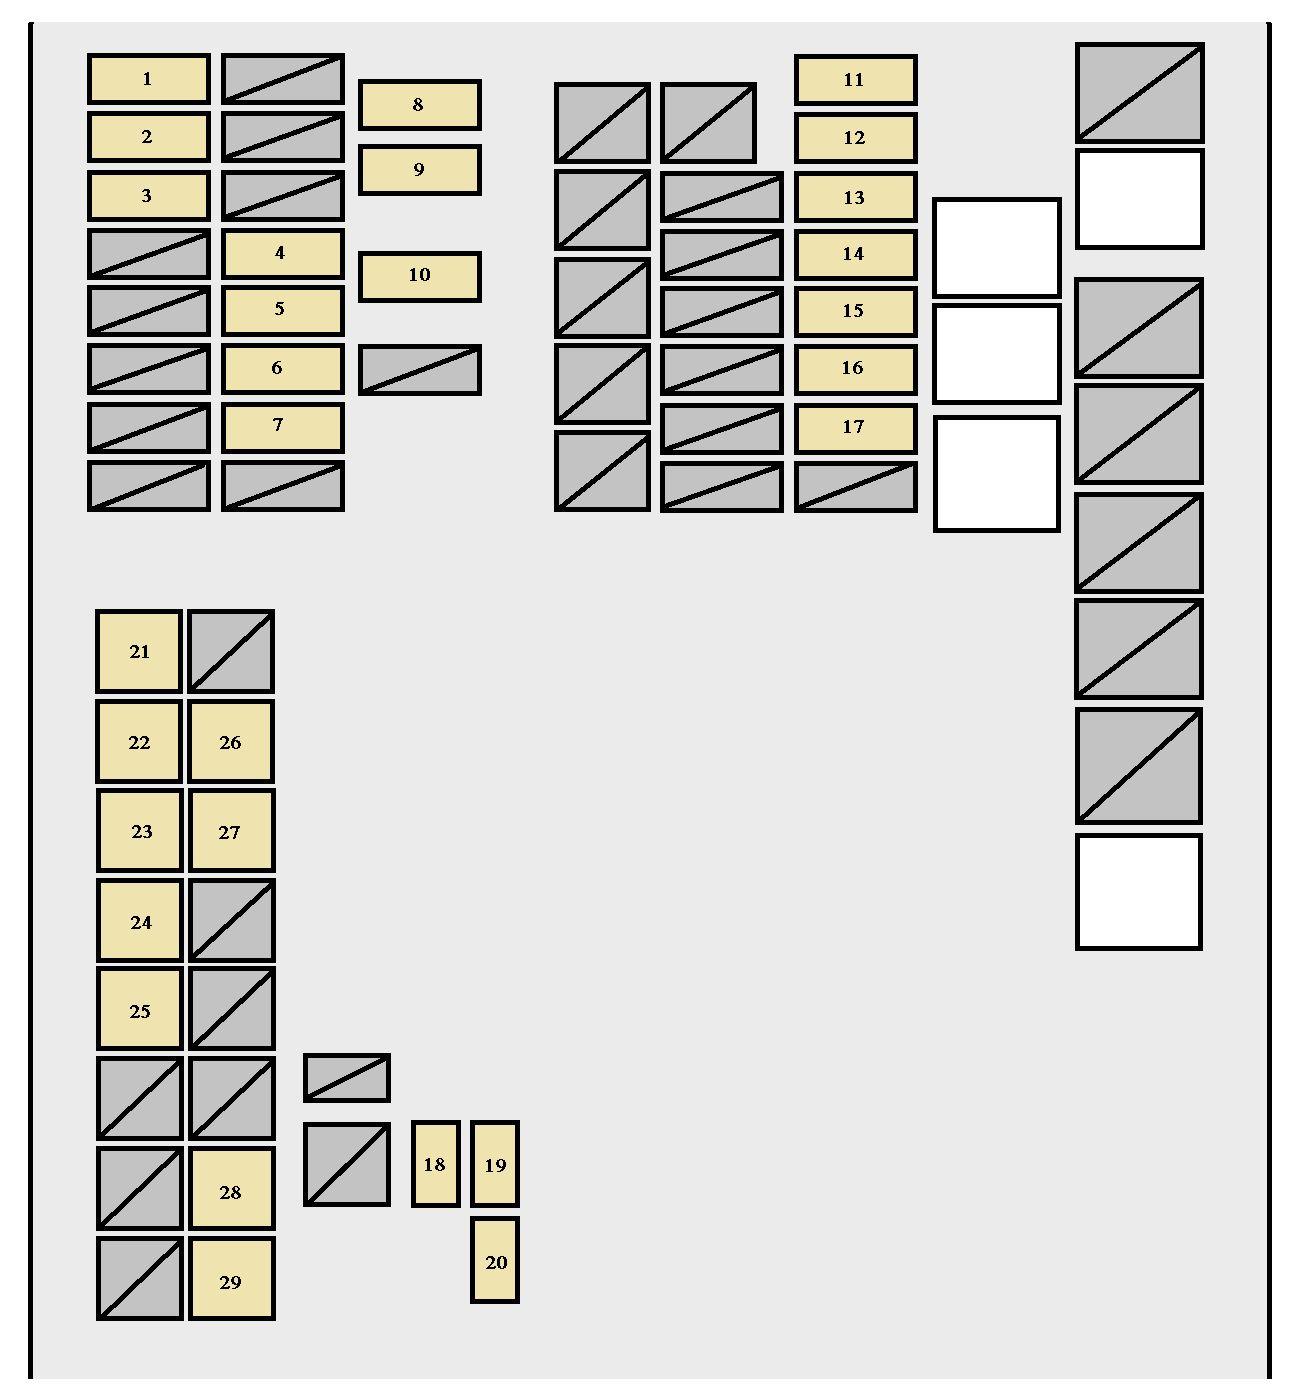 2007 ford mustang fuse box diagram